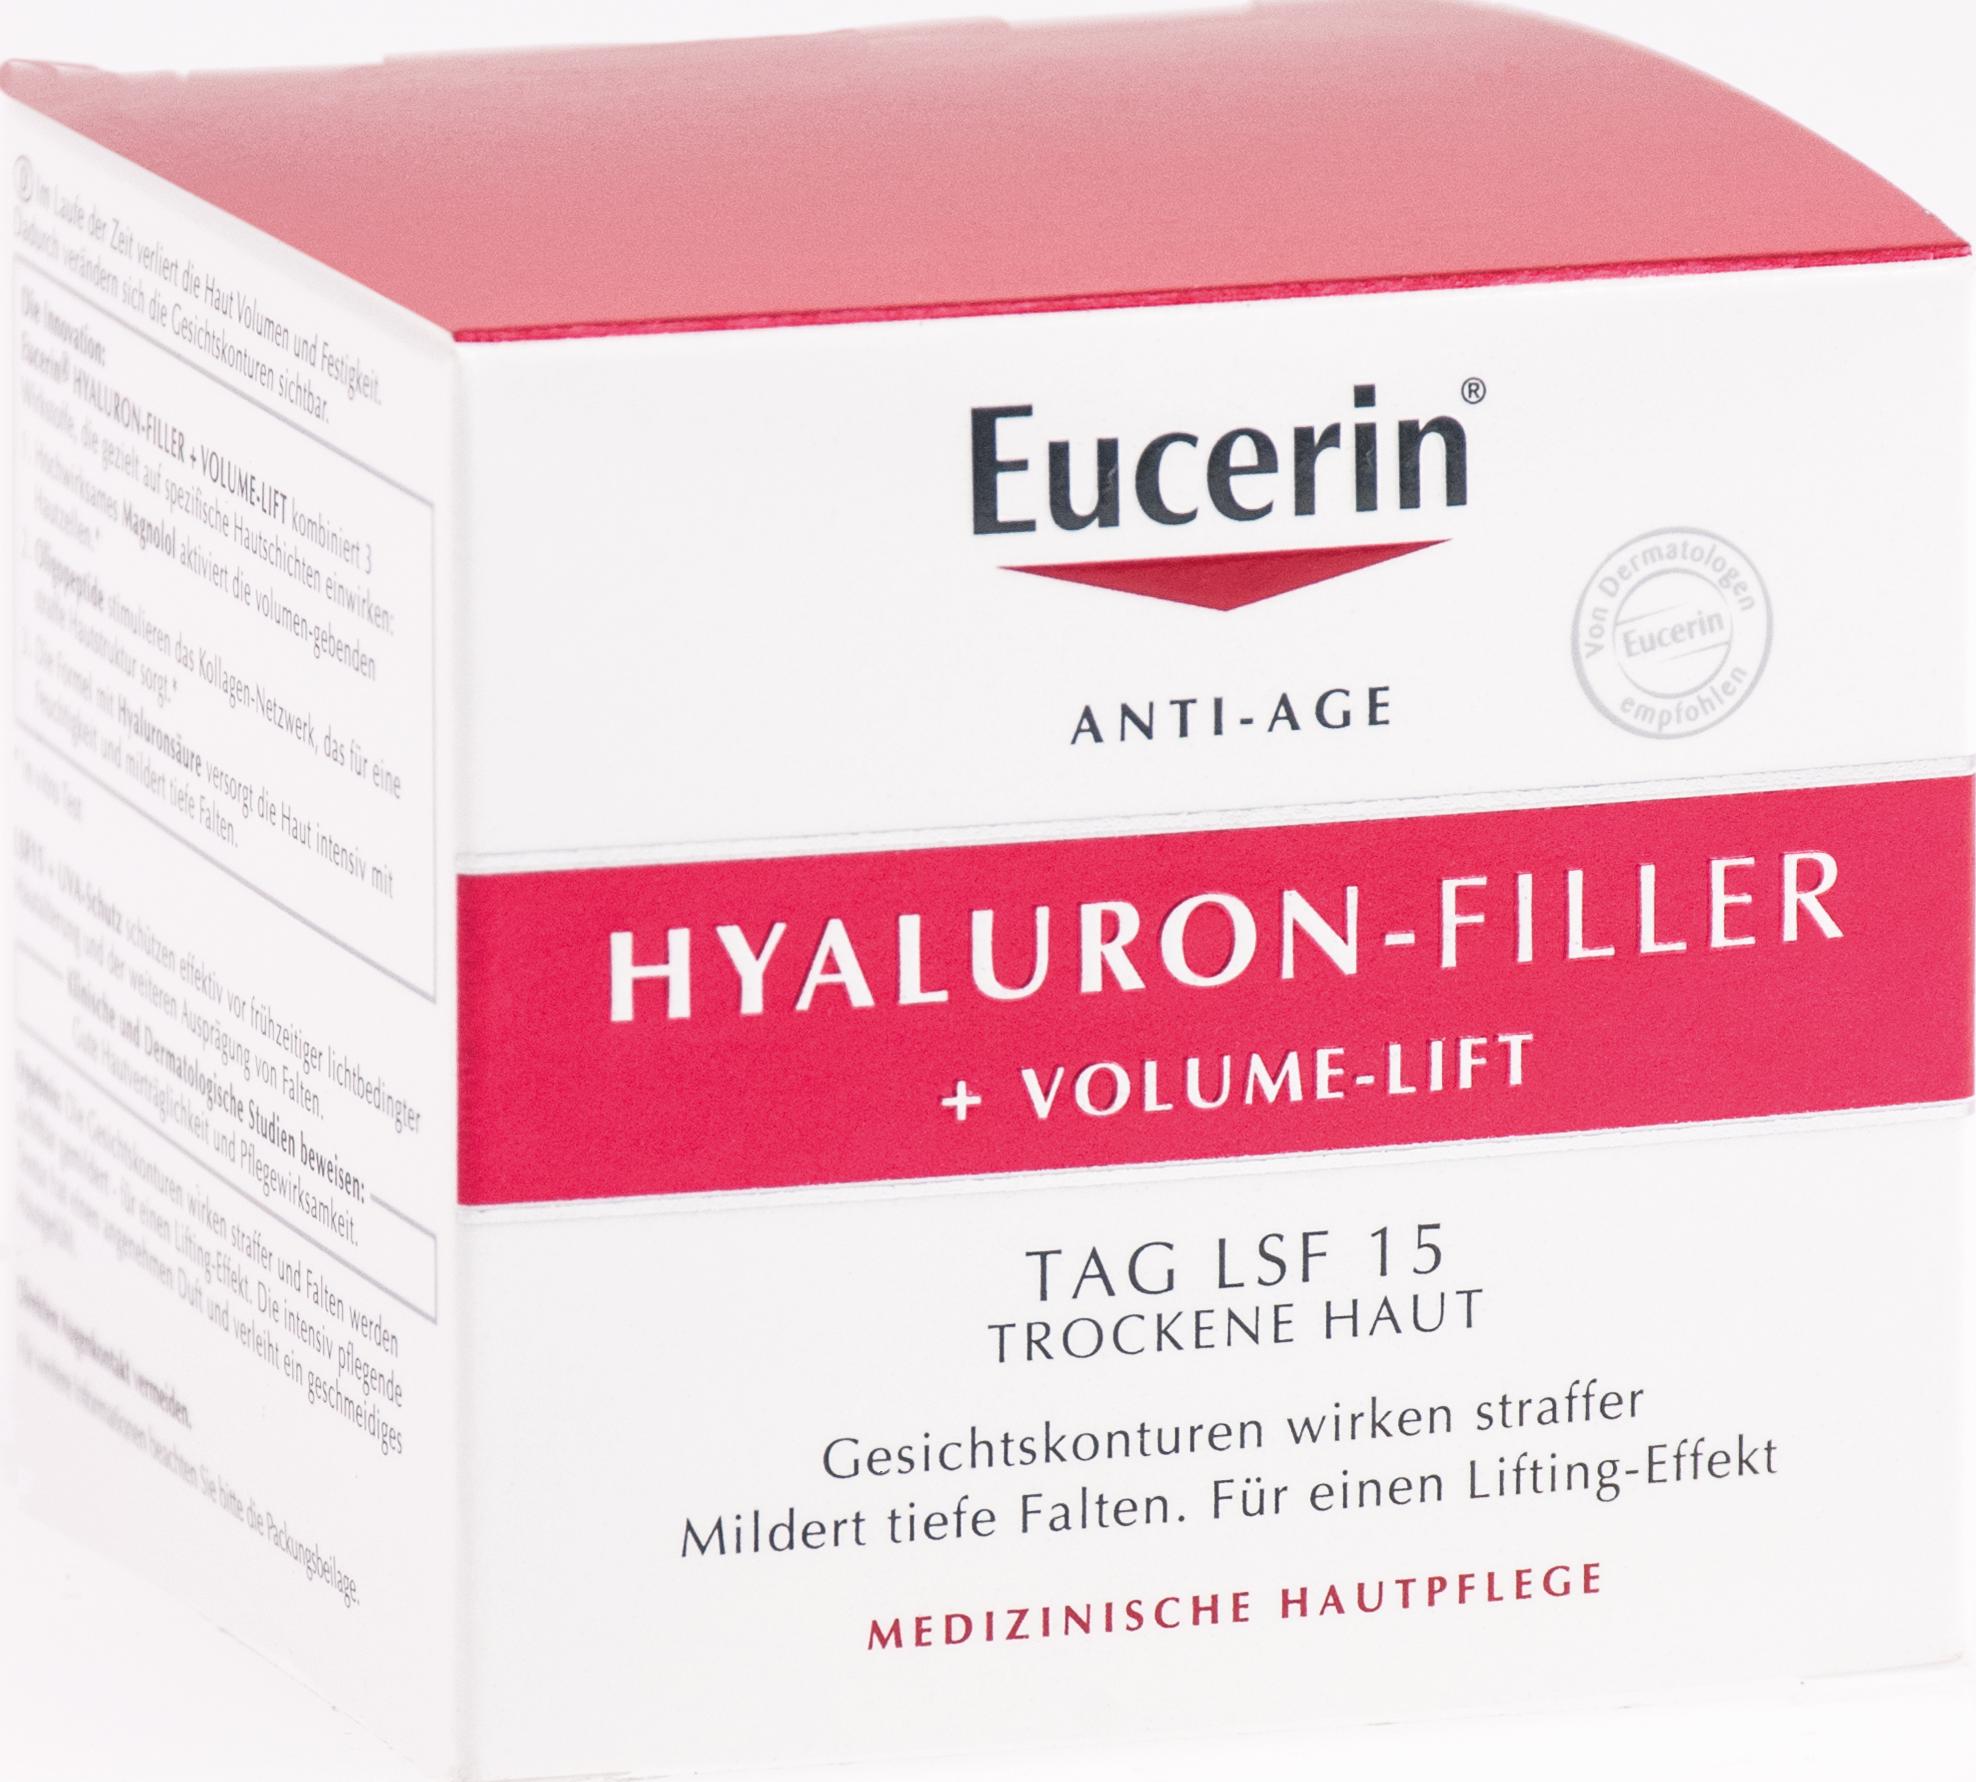 Eucerin Anti-Age VOLUME-FILLER trockene Haut